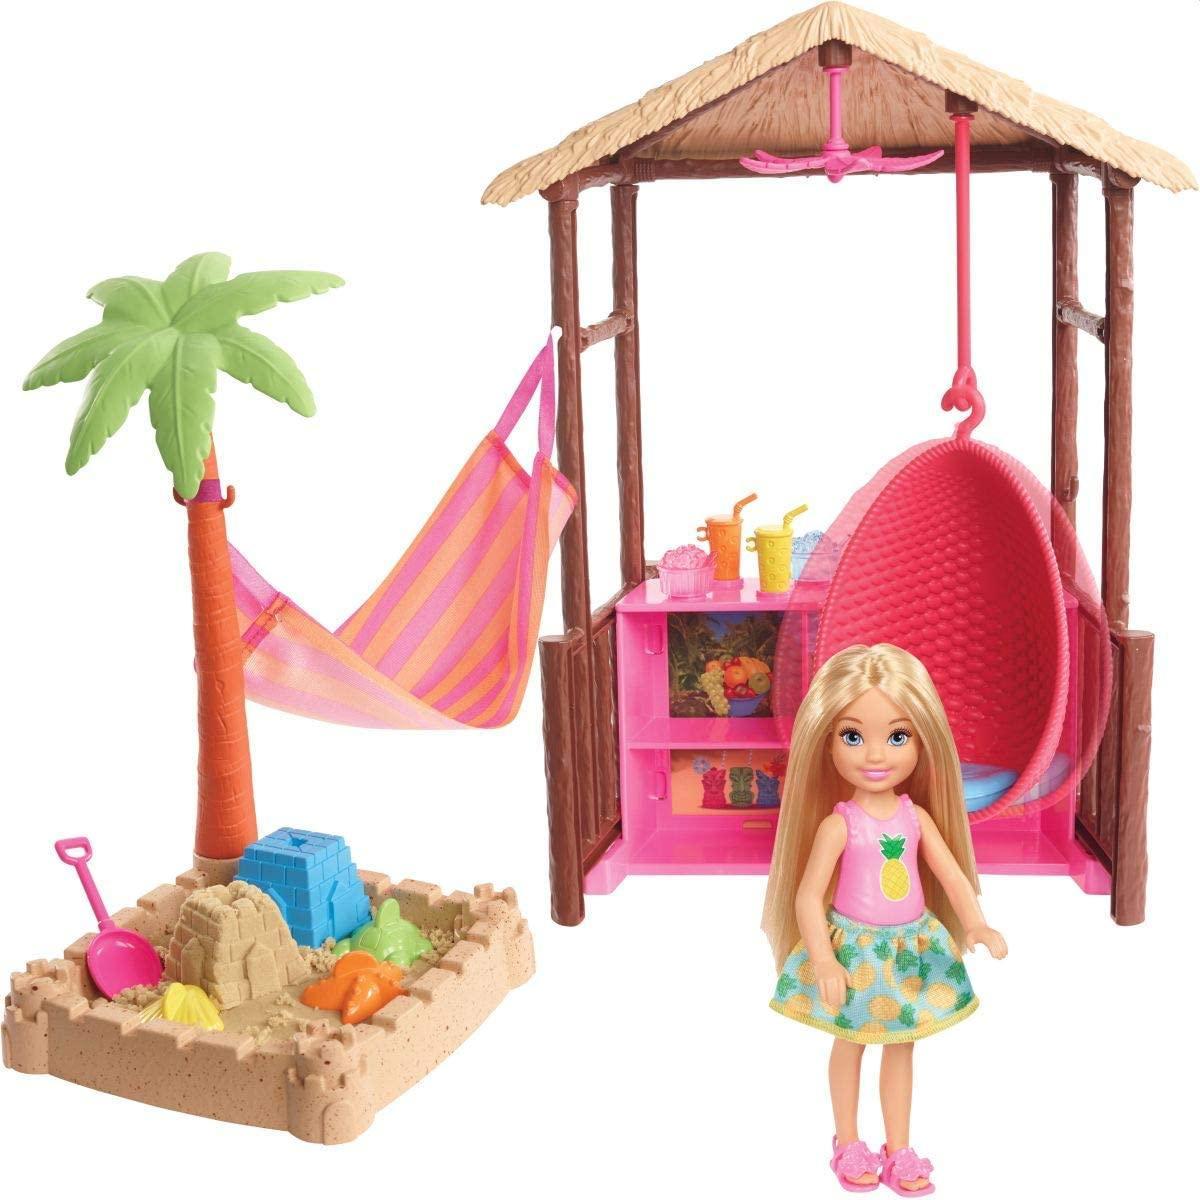 Barbie Club Chelsea and Tiki Hut Playset Оригинал Mattel